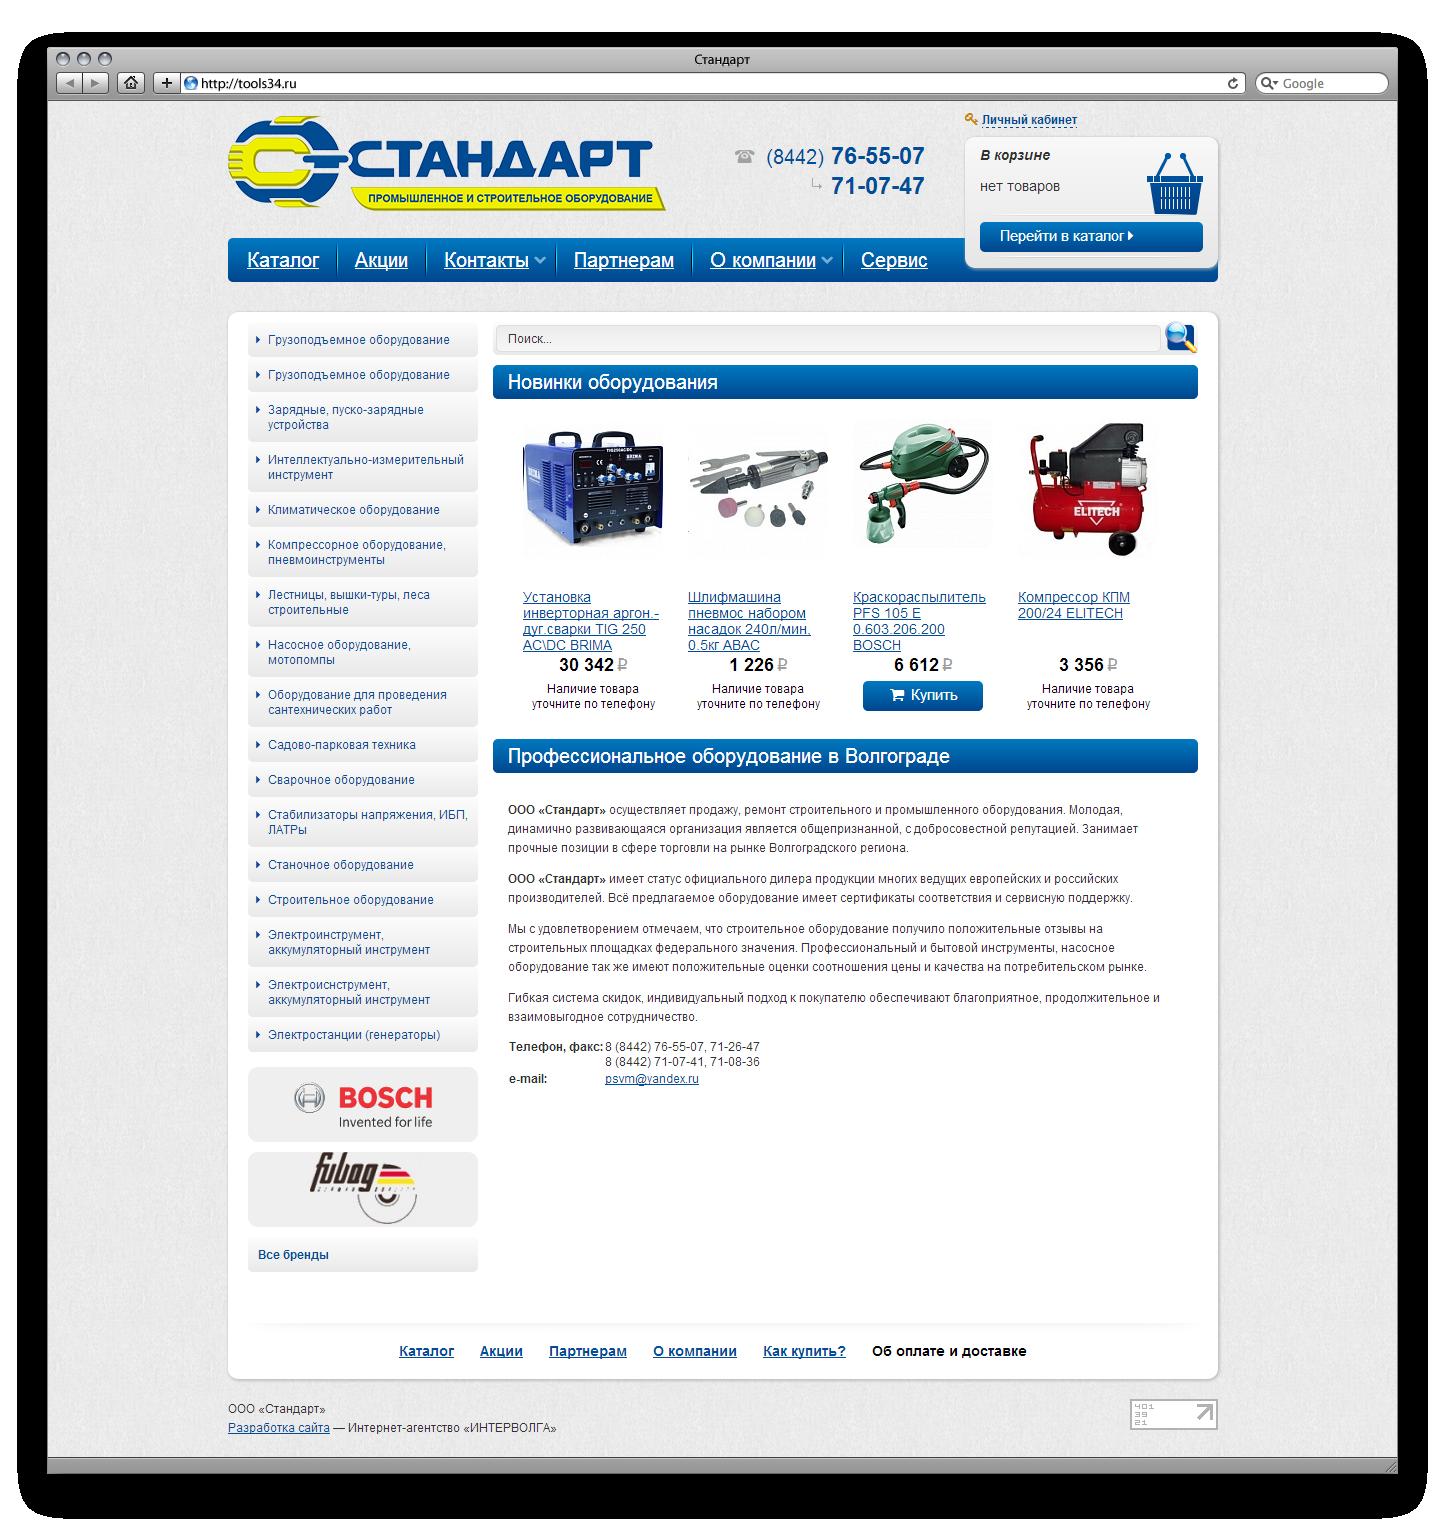 Инженерная компания стандарт екатеринбург официальный сайт официальный сайт компании гугл москва